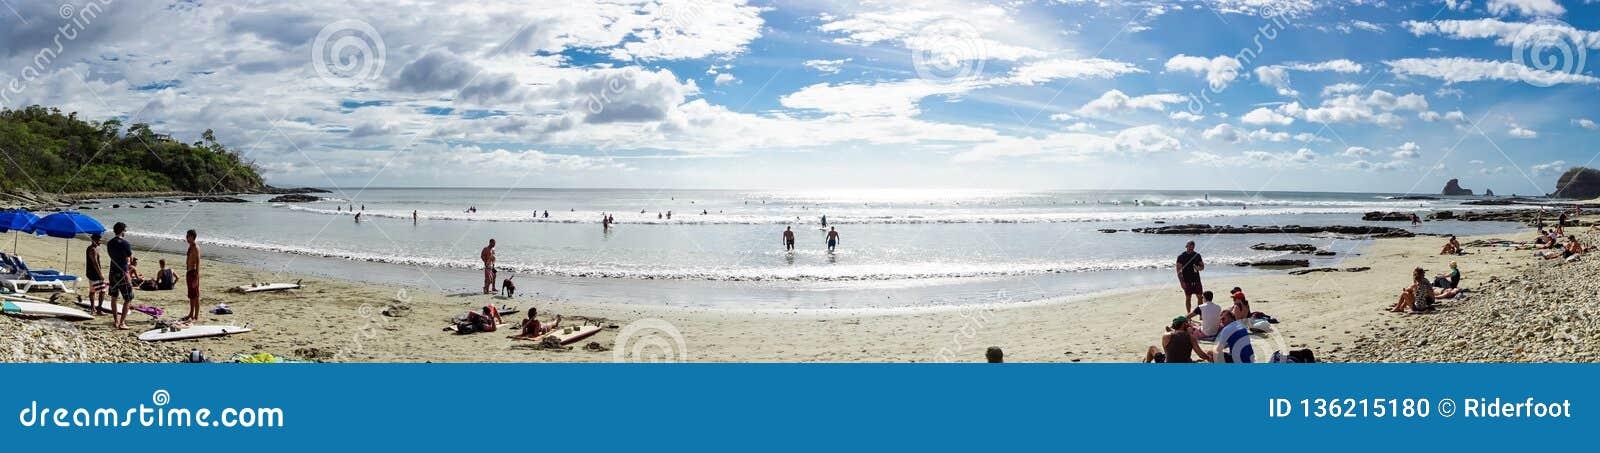 San Juan Del Sur Nicaragua January 19 2018 Playa Maderas Surf